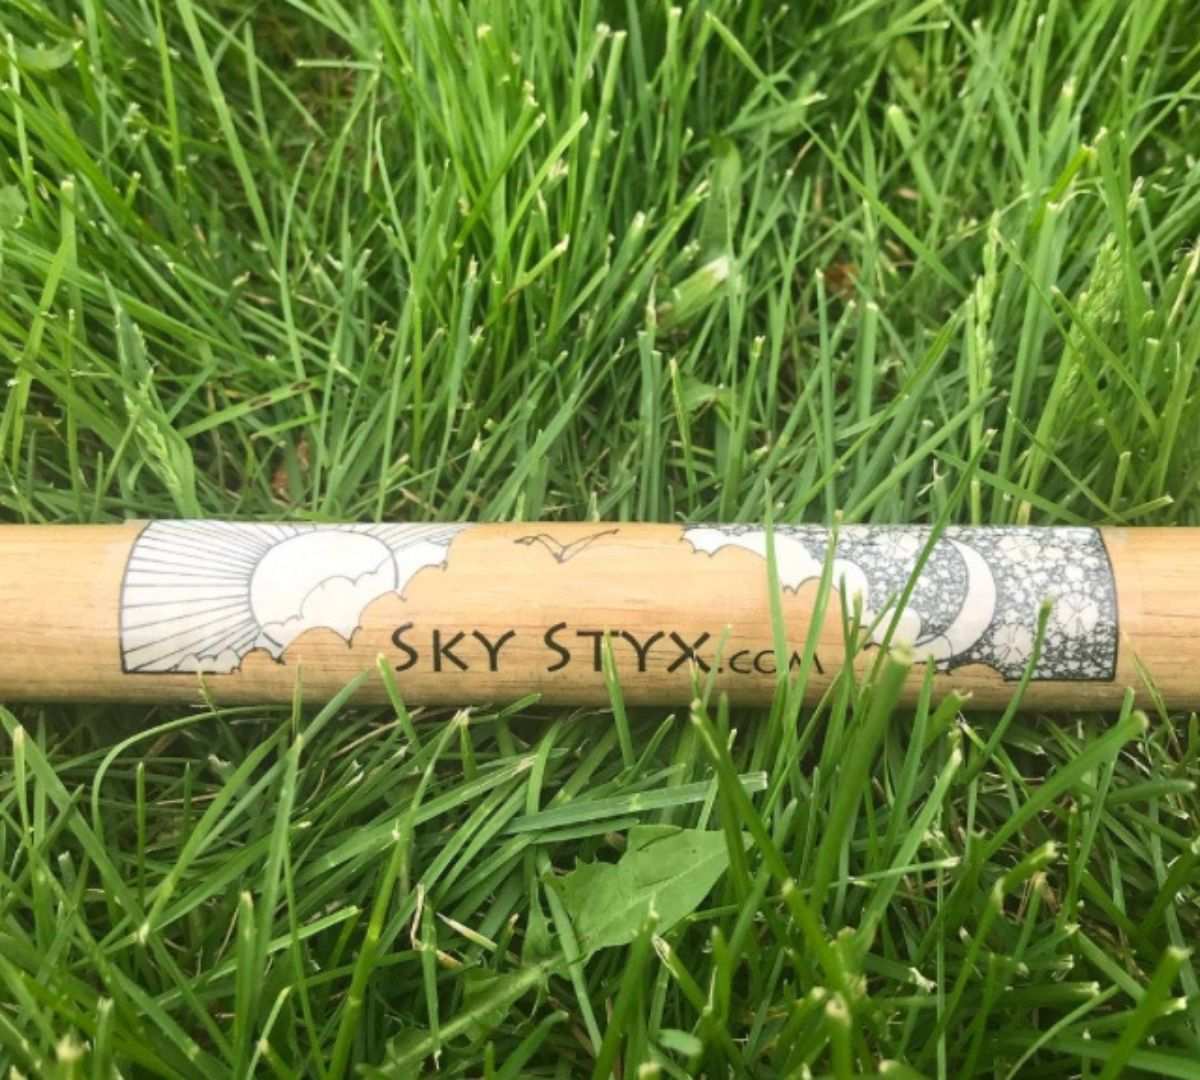 Sky Styx Staff in grass.